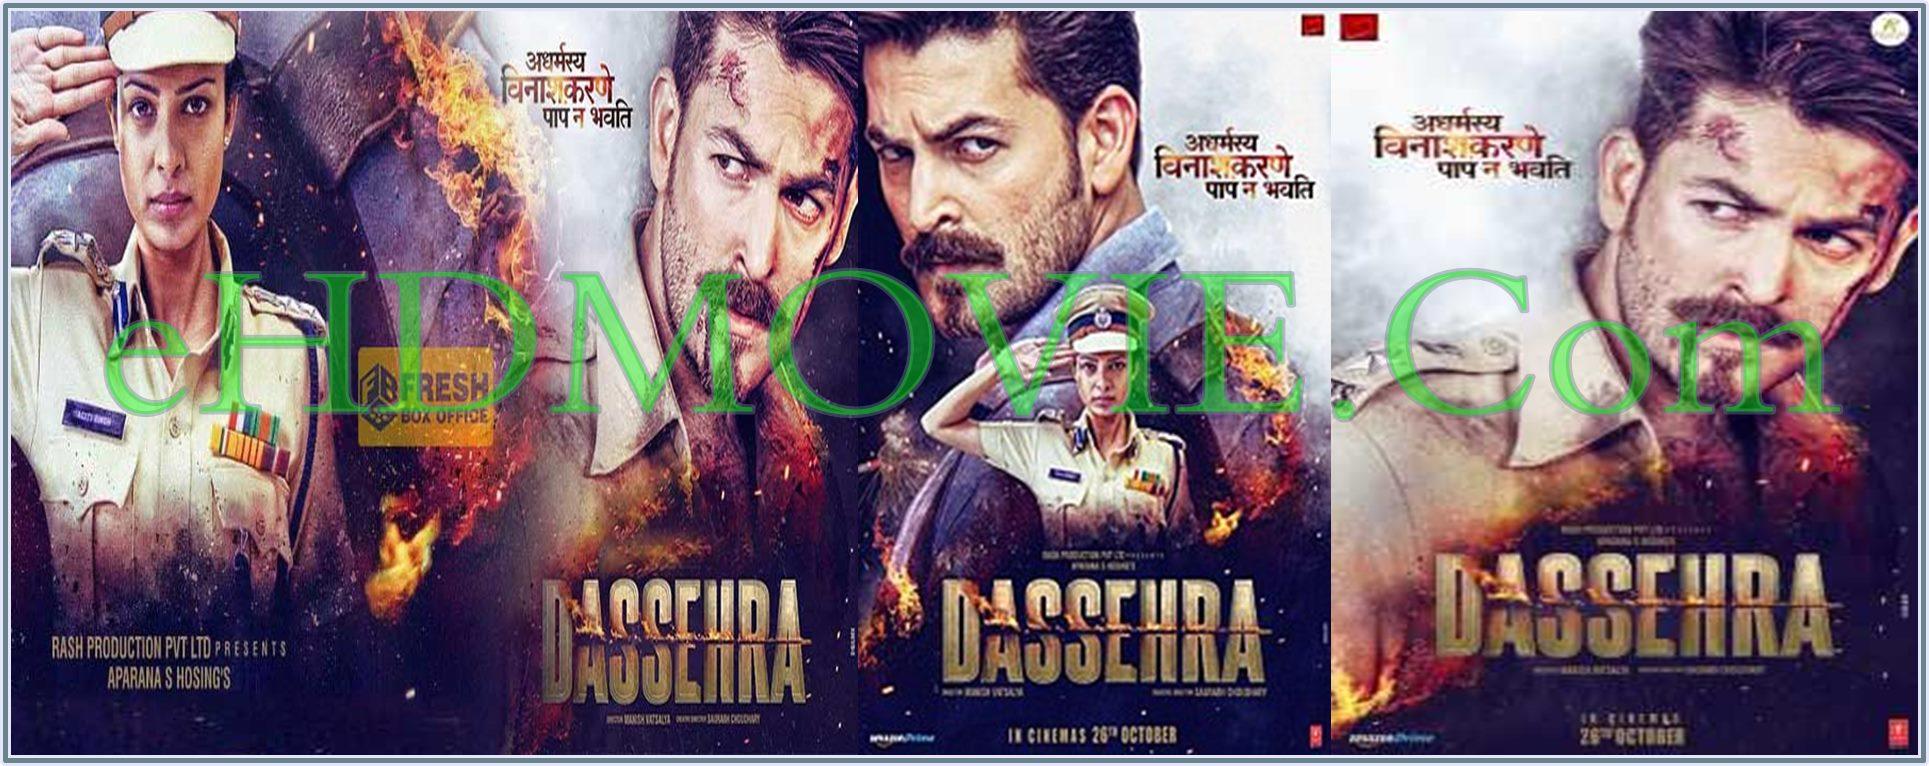 Dassehra 2018 Full Movie Hindi 1080p – 720p – HEVC – 480p ORG WEB-DL 350MB – 550MB – 1.2GB – 2GB ESubs Free Download